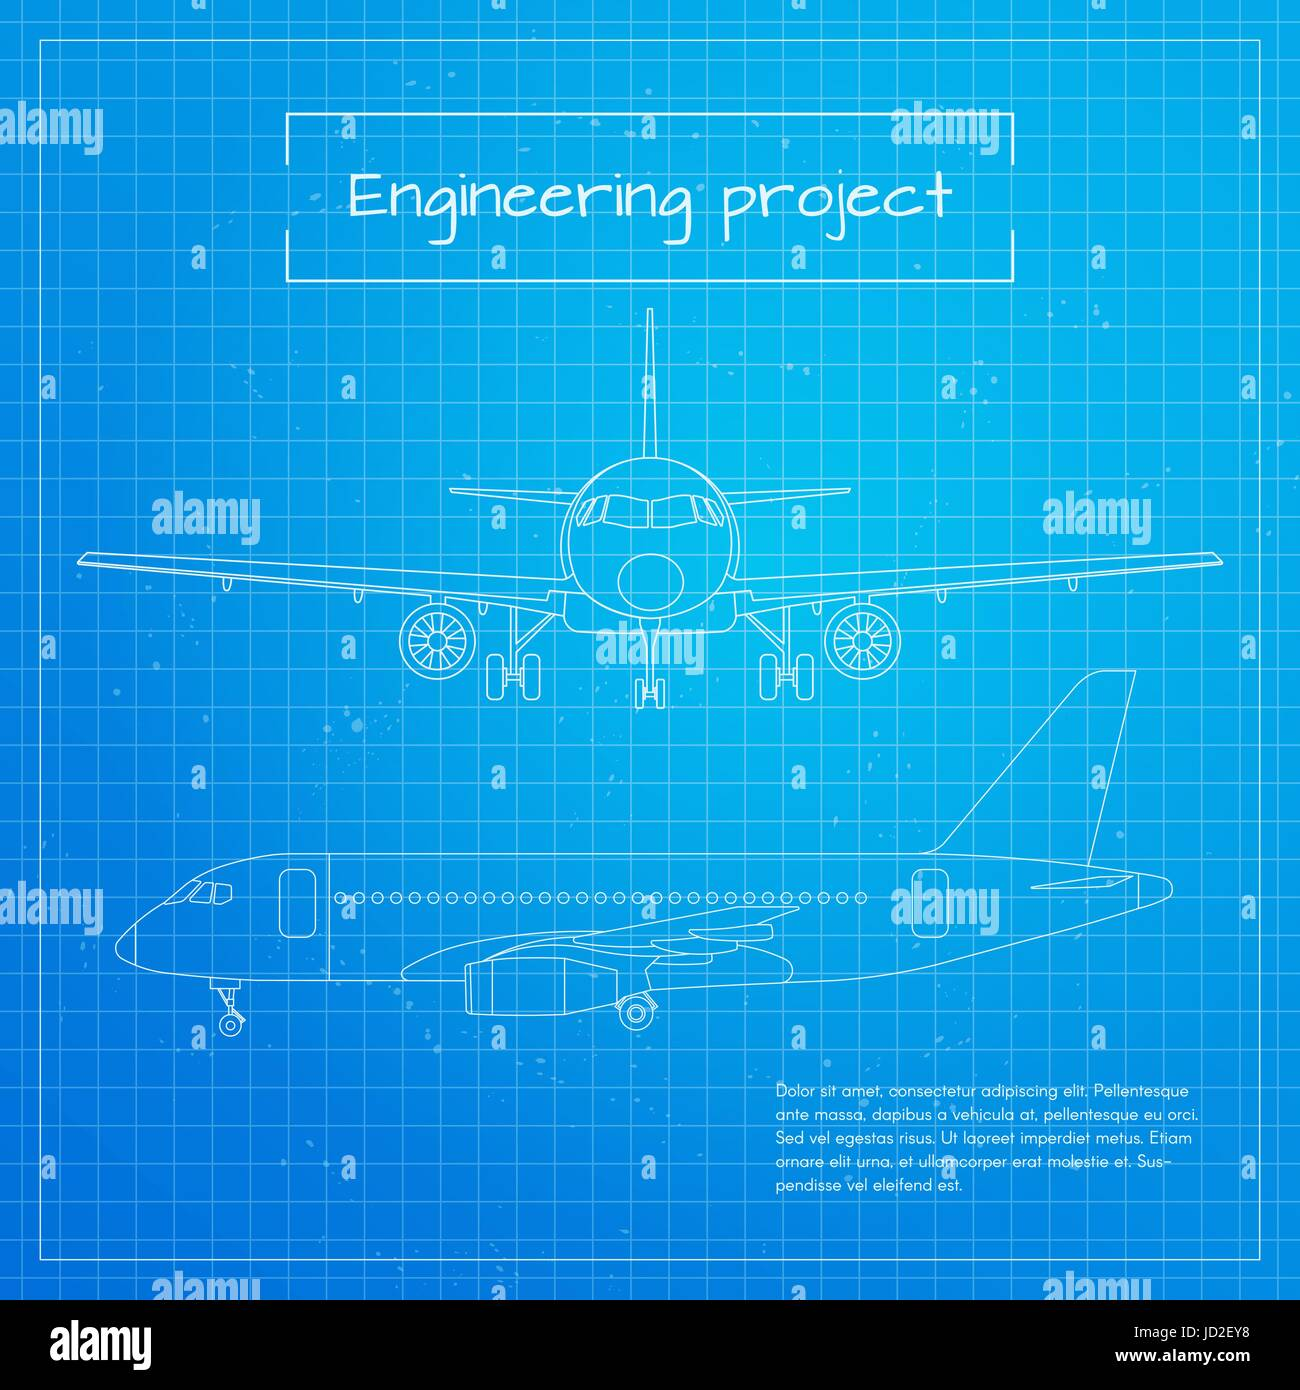 Vector illustration of plane engineering aircraft blueprint stock vector illustration of plane engineering aircraft blueprint background or project malvernweather Images